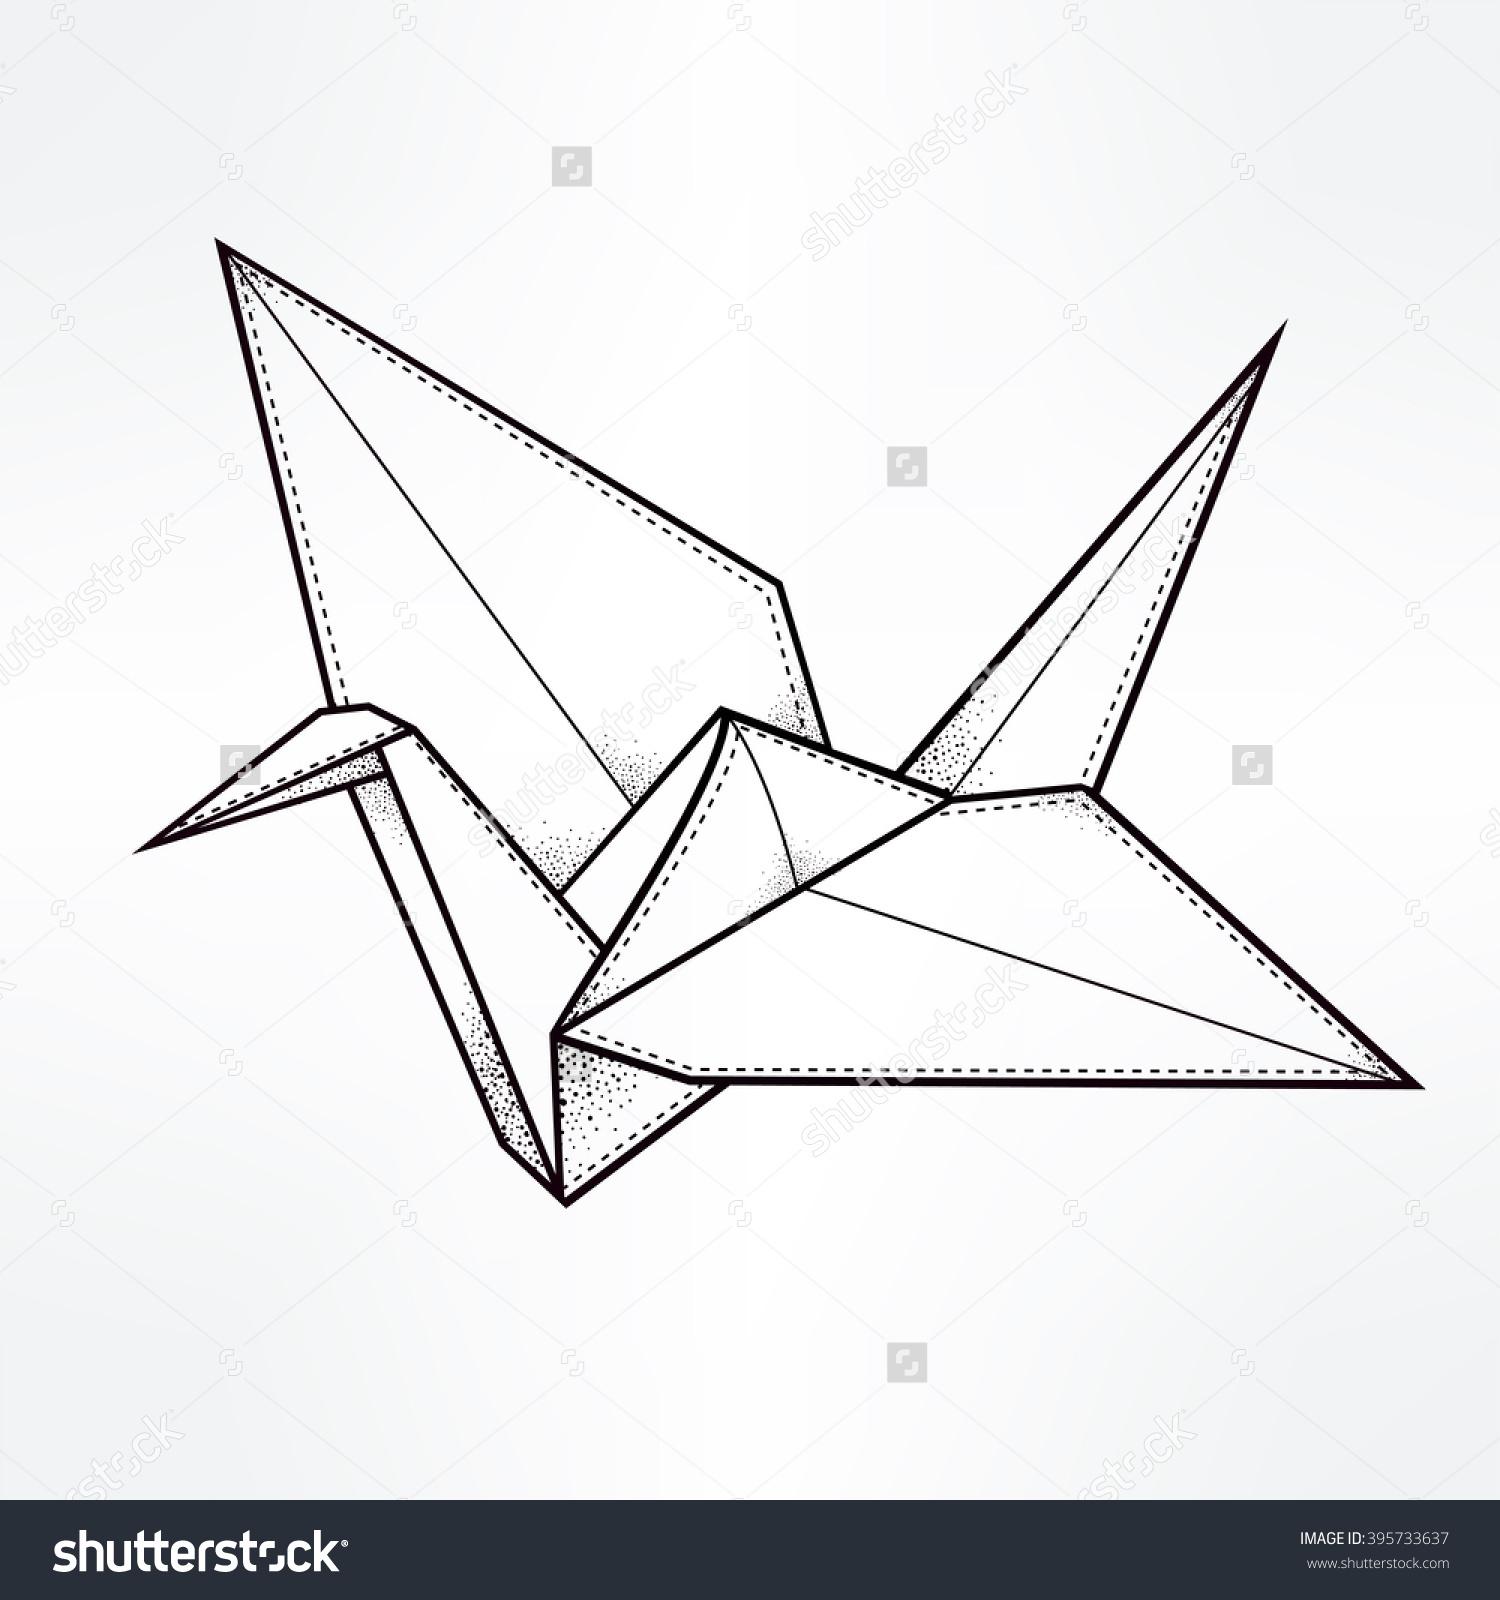 Drawn origami Origami drawing [Origami] pdf bird